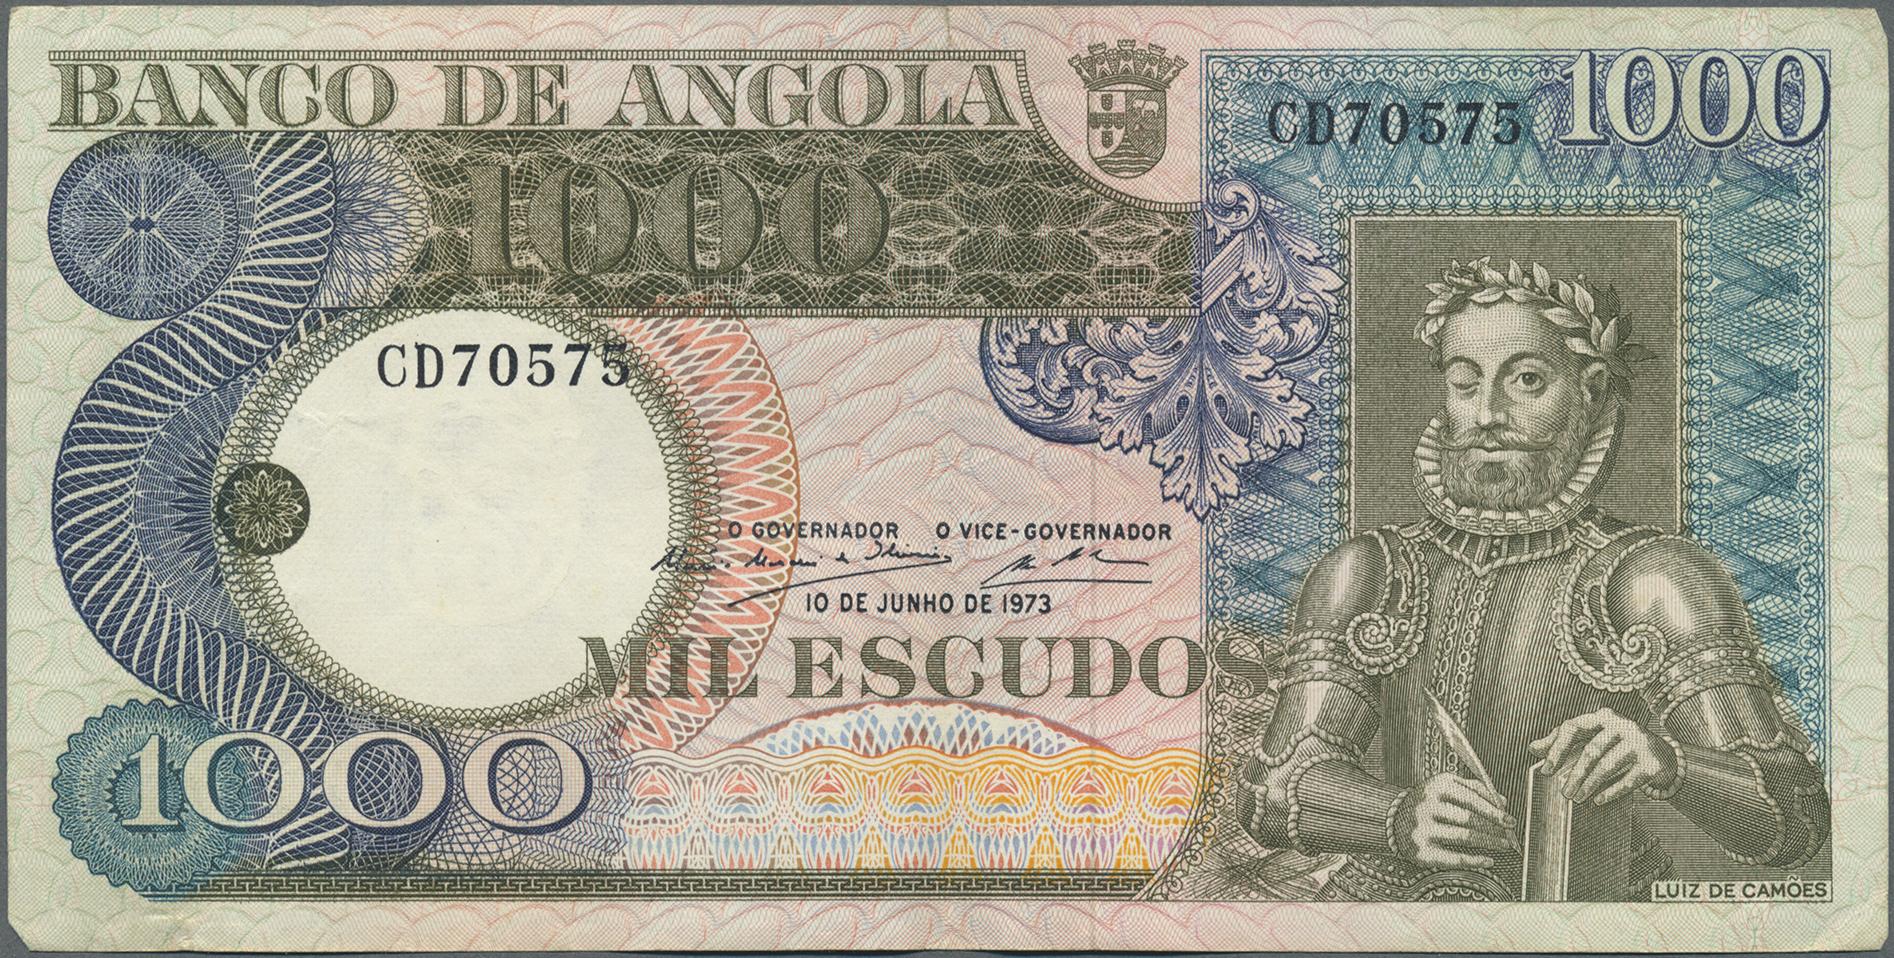 Lot 01003 - Angola | Banknoten  -  Auktionshaus Christoph Gärtner GmbH & Co. KG Sale #48 The Banknotes